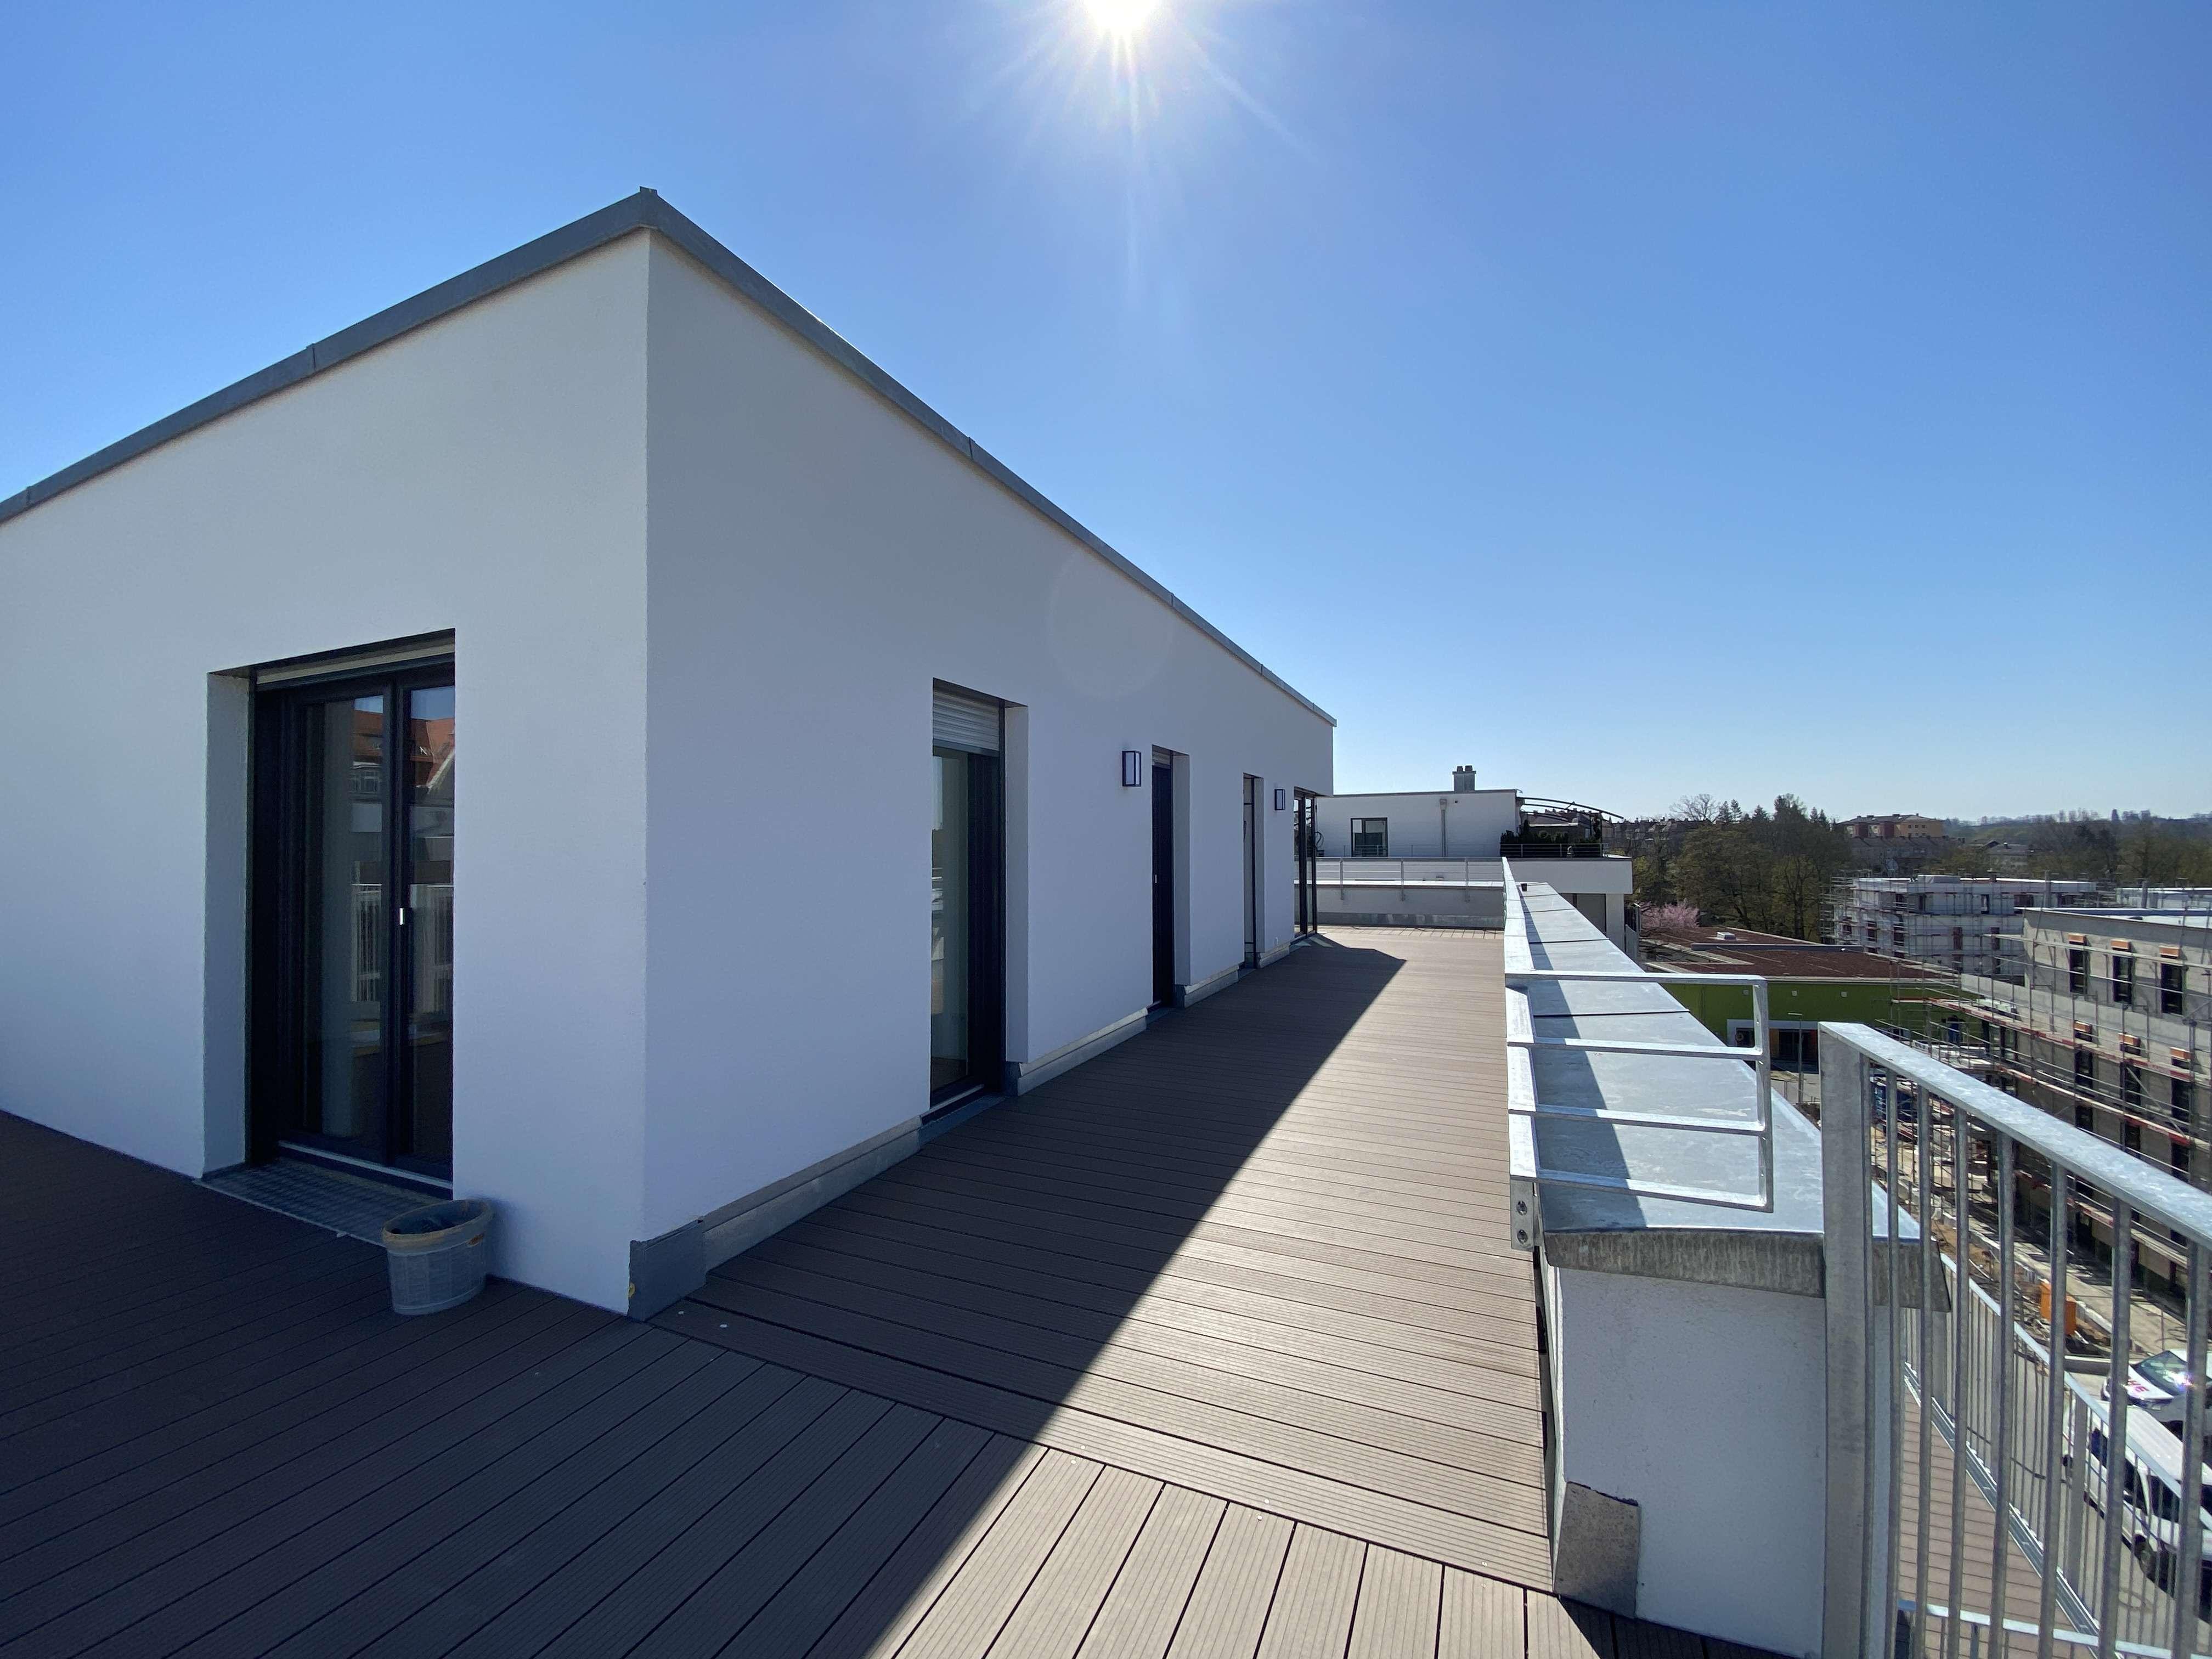 Neubau-Erstbezug: 3-Zi-Terrassen-Whg im Penthousestil, Nähe Rednitzgrund in